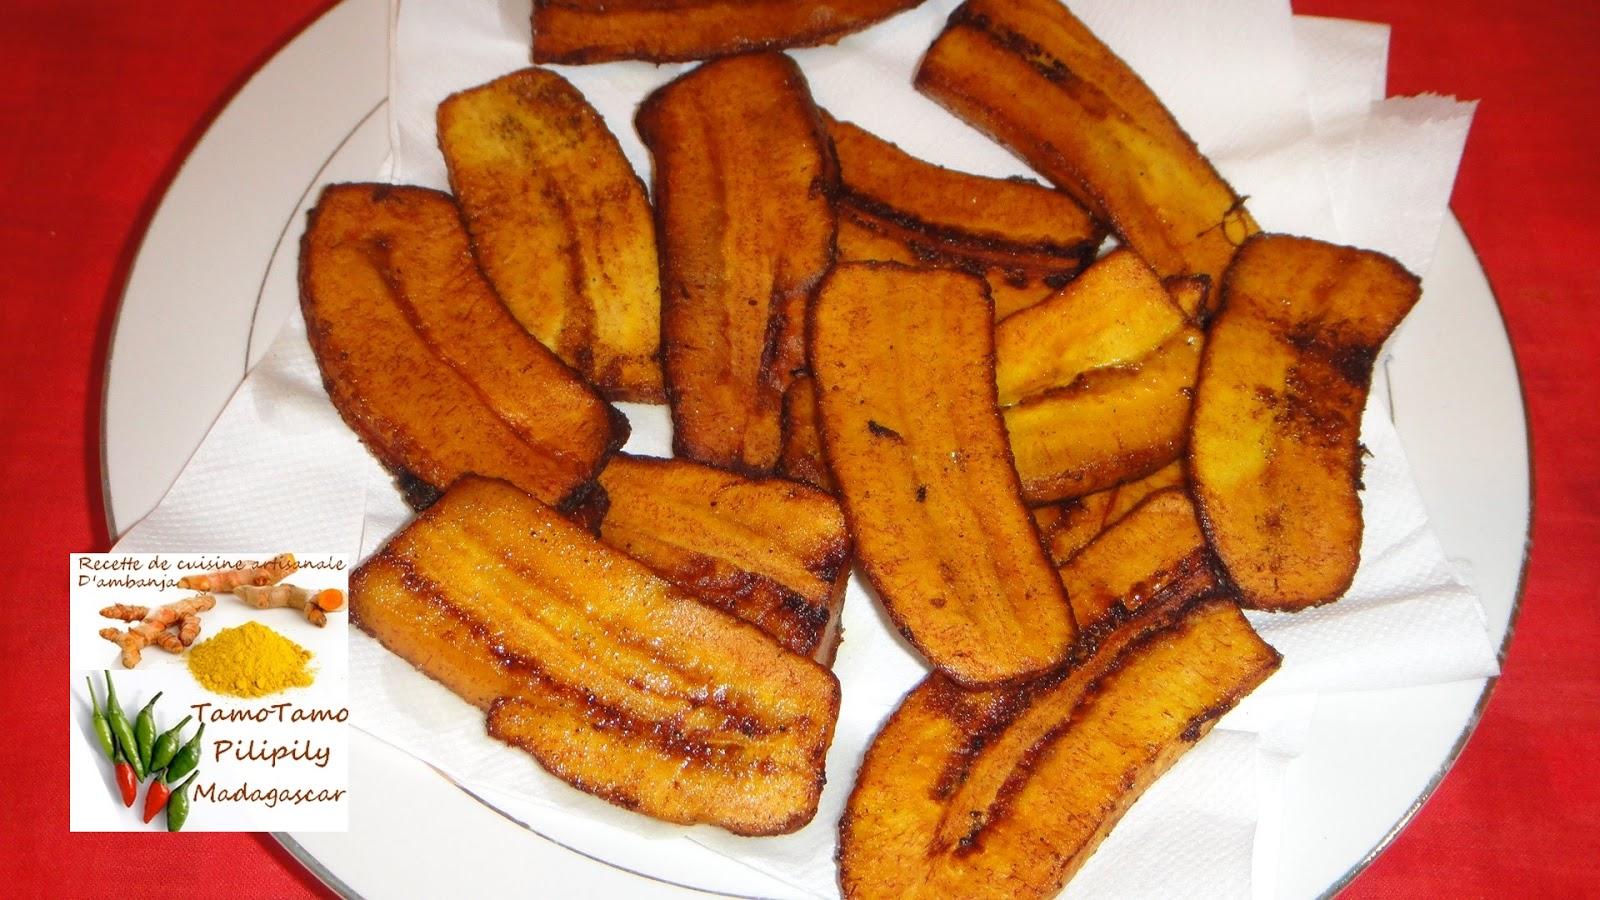 Cuisine artisanale d 39 ambanja madagascar bananes - Cuisiner des bananes plantain ...